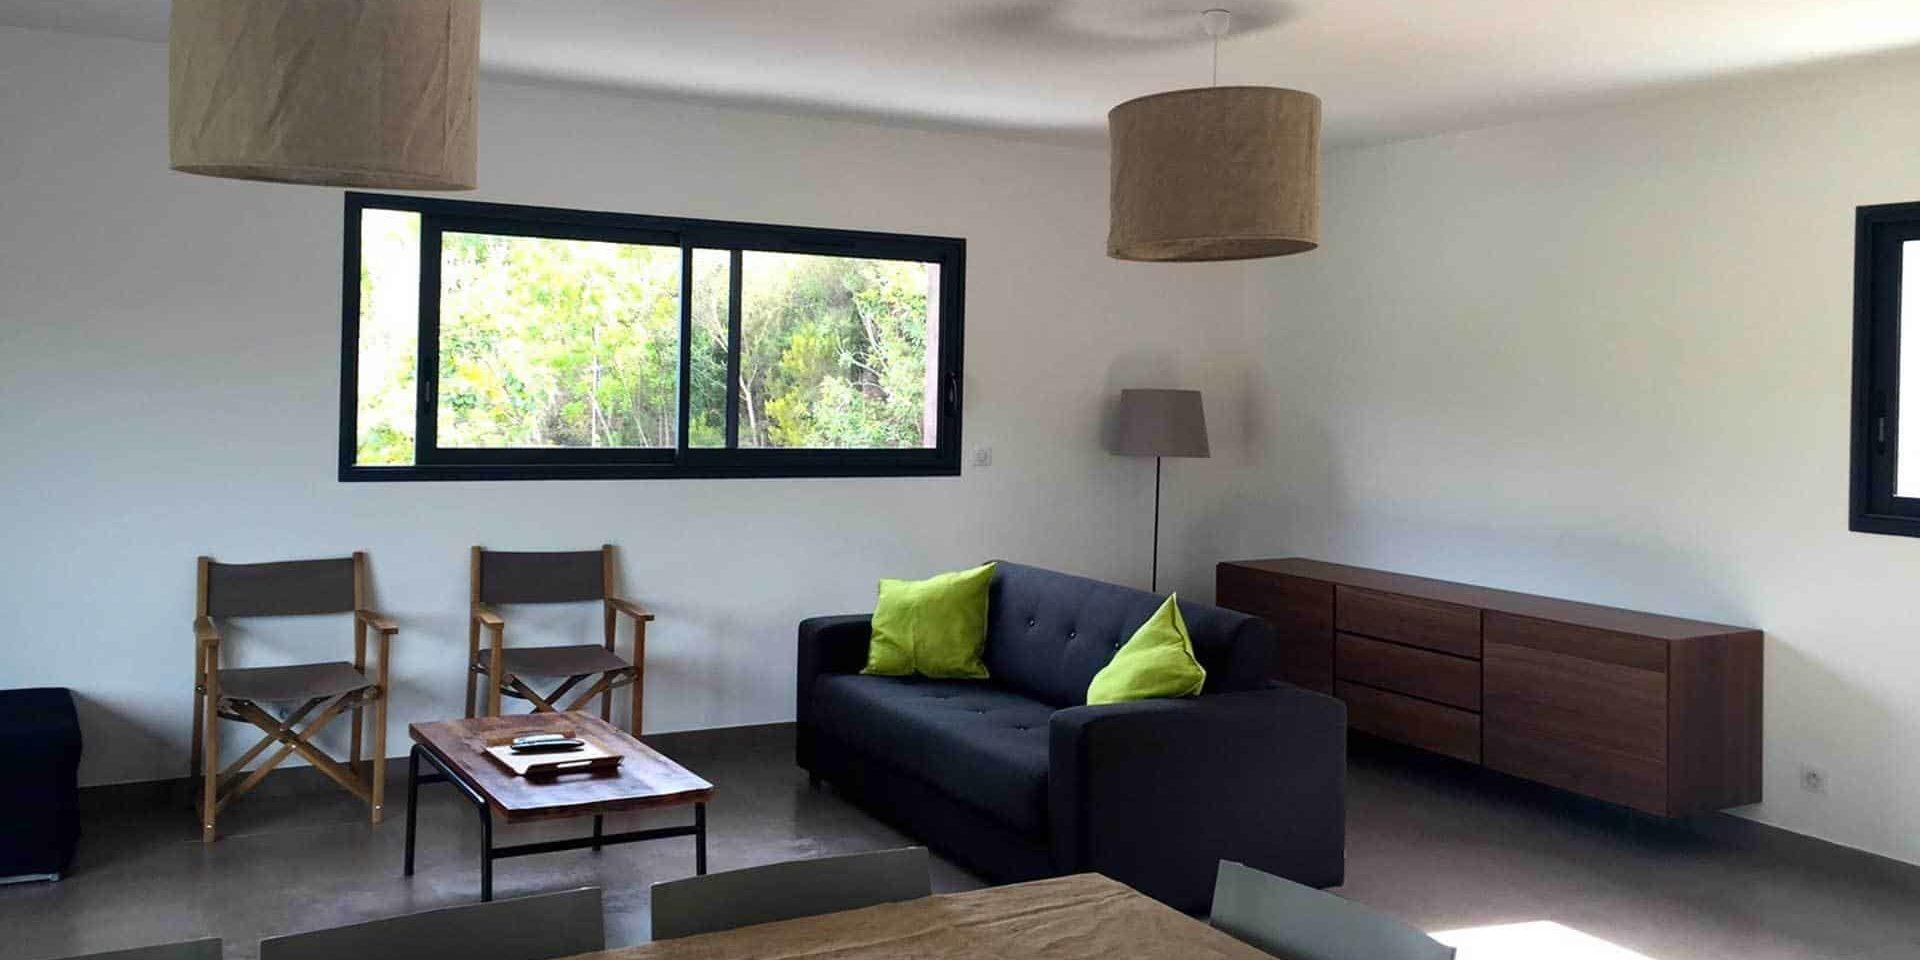 Les Villas de Lorello Porticcio Corsica Frankrijk interieur appartement Eucalyptus